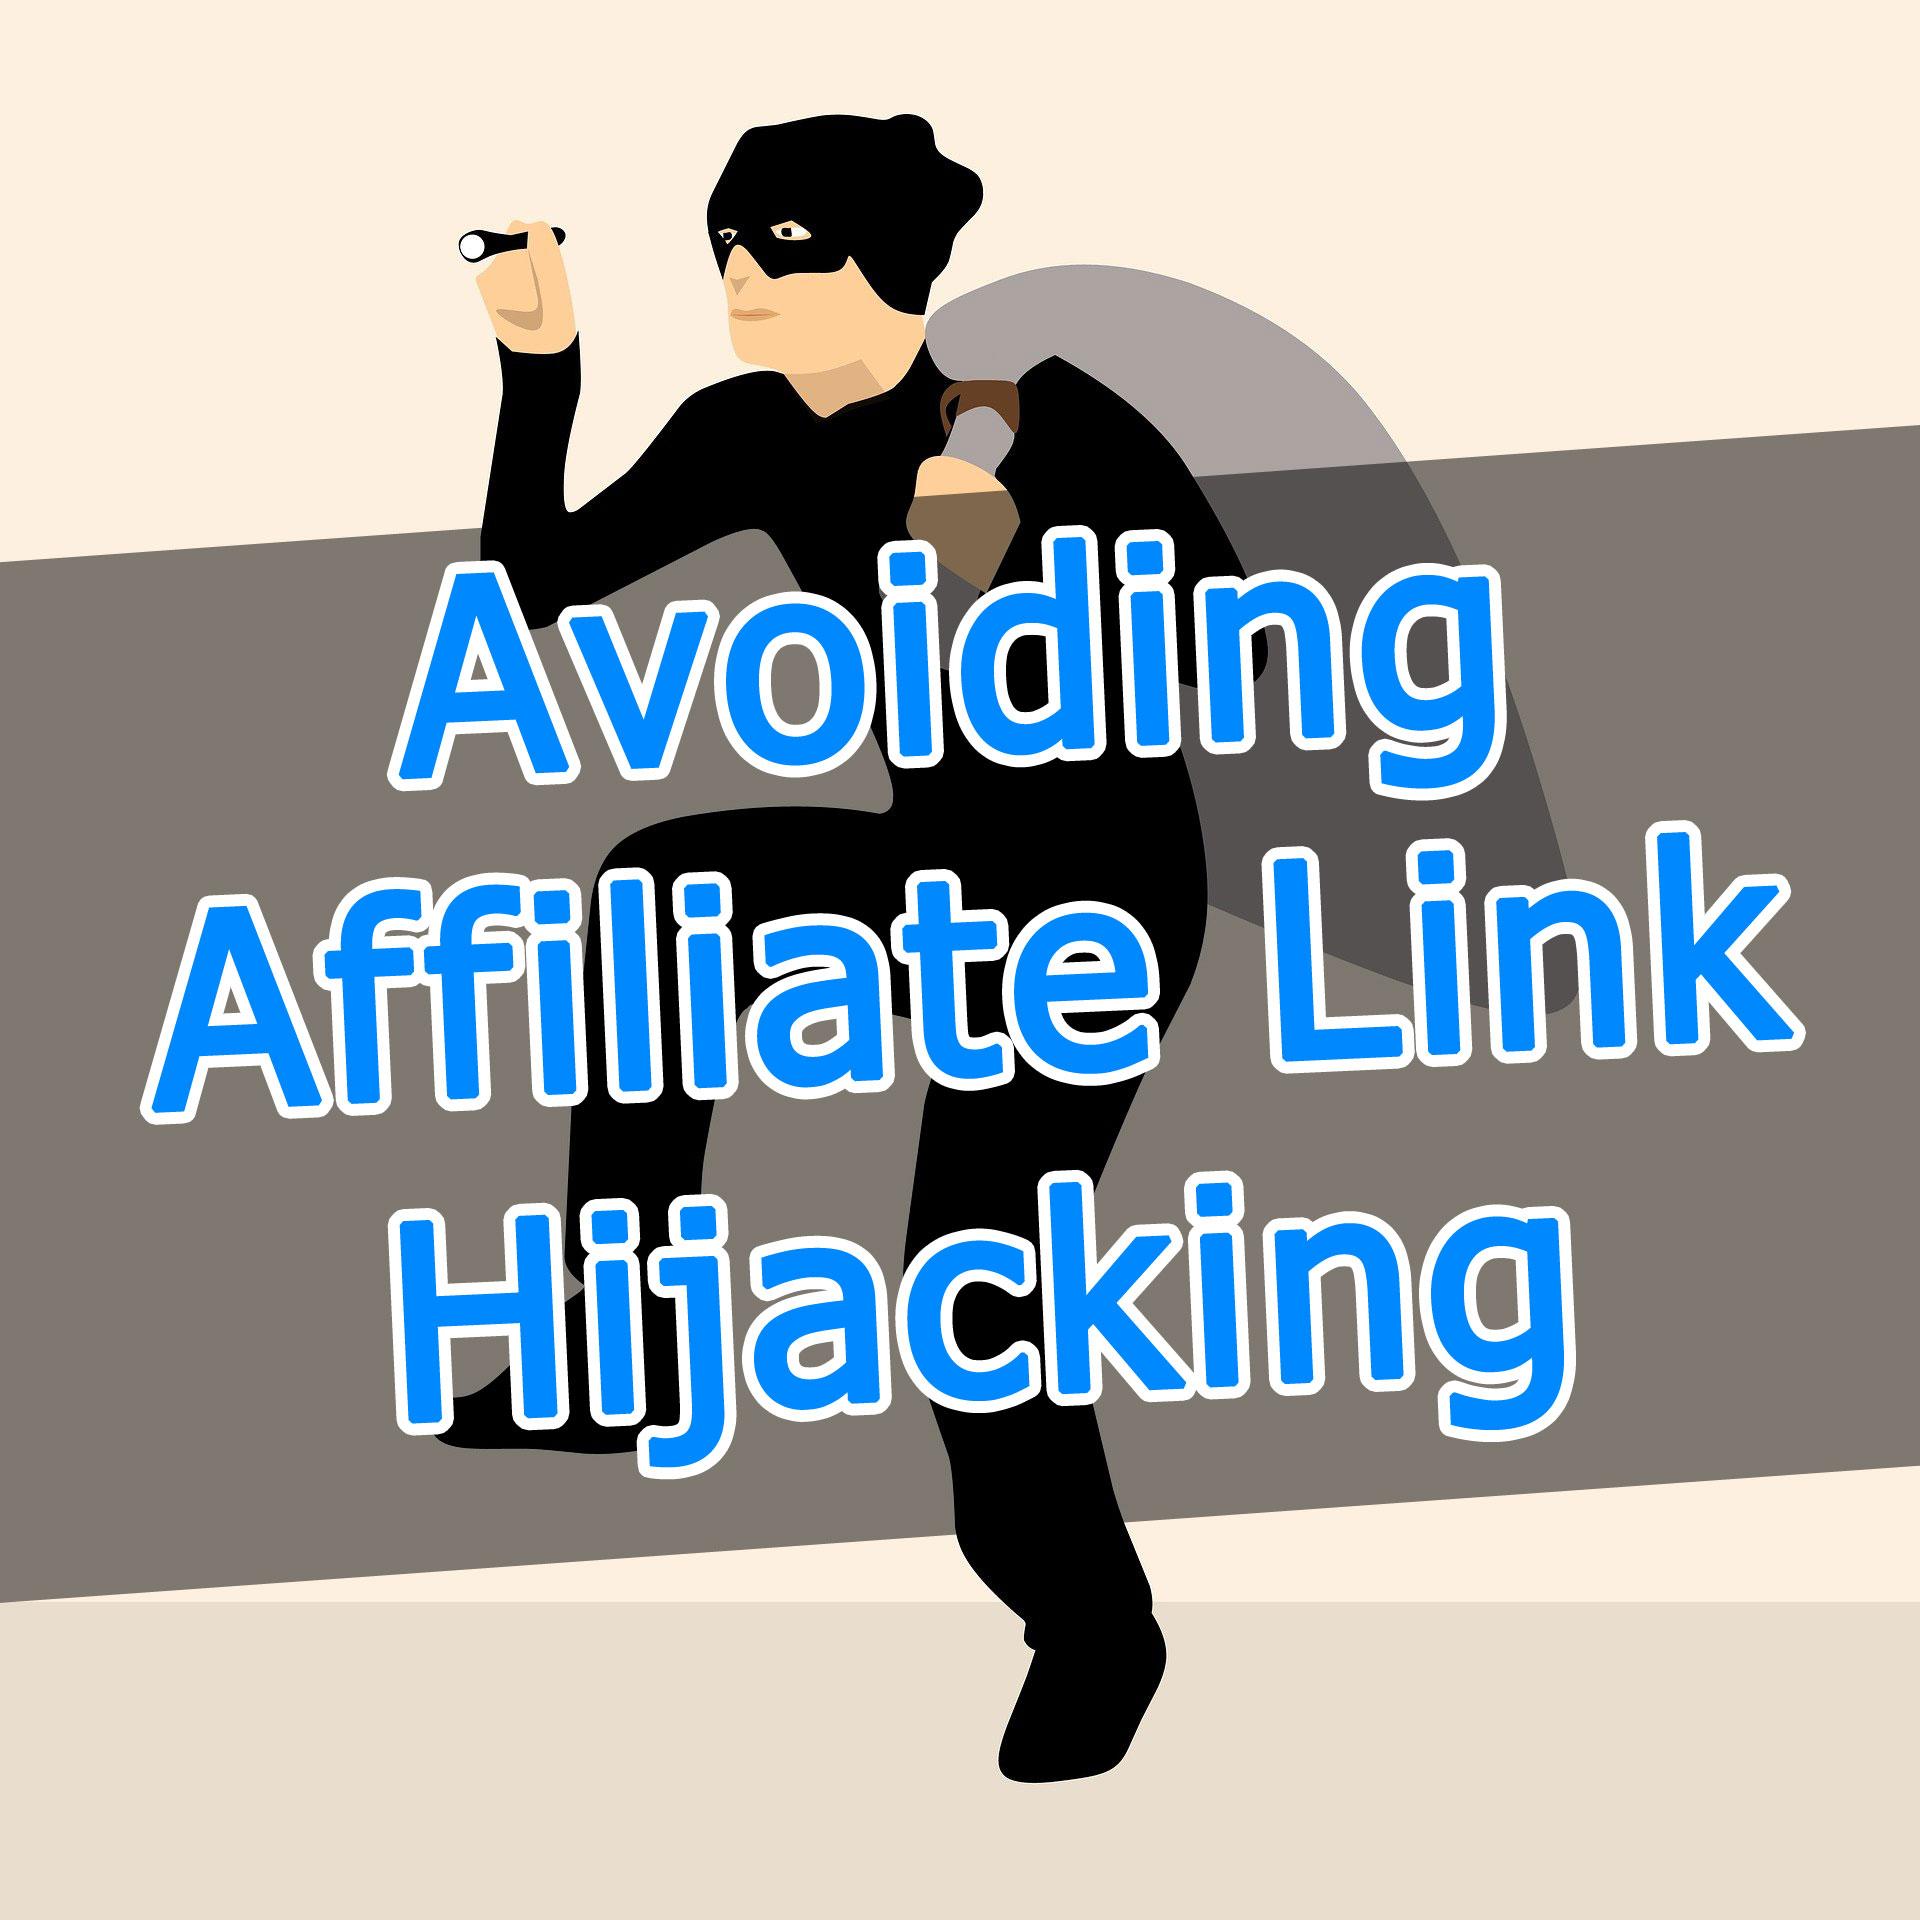 Avoiding Affiliate Link Hijacking